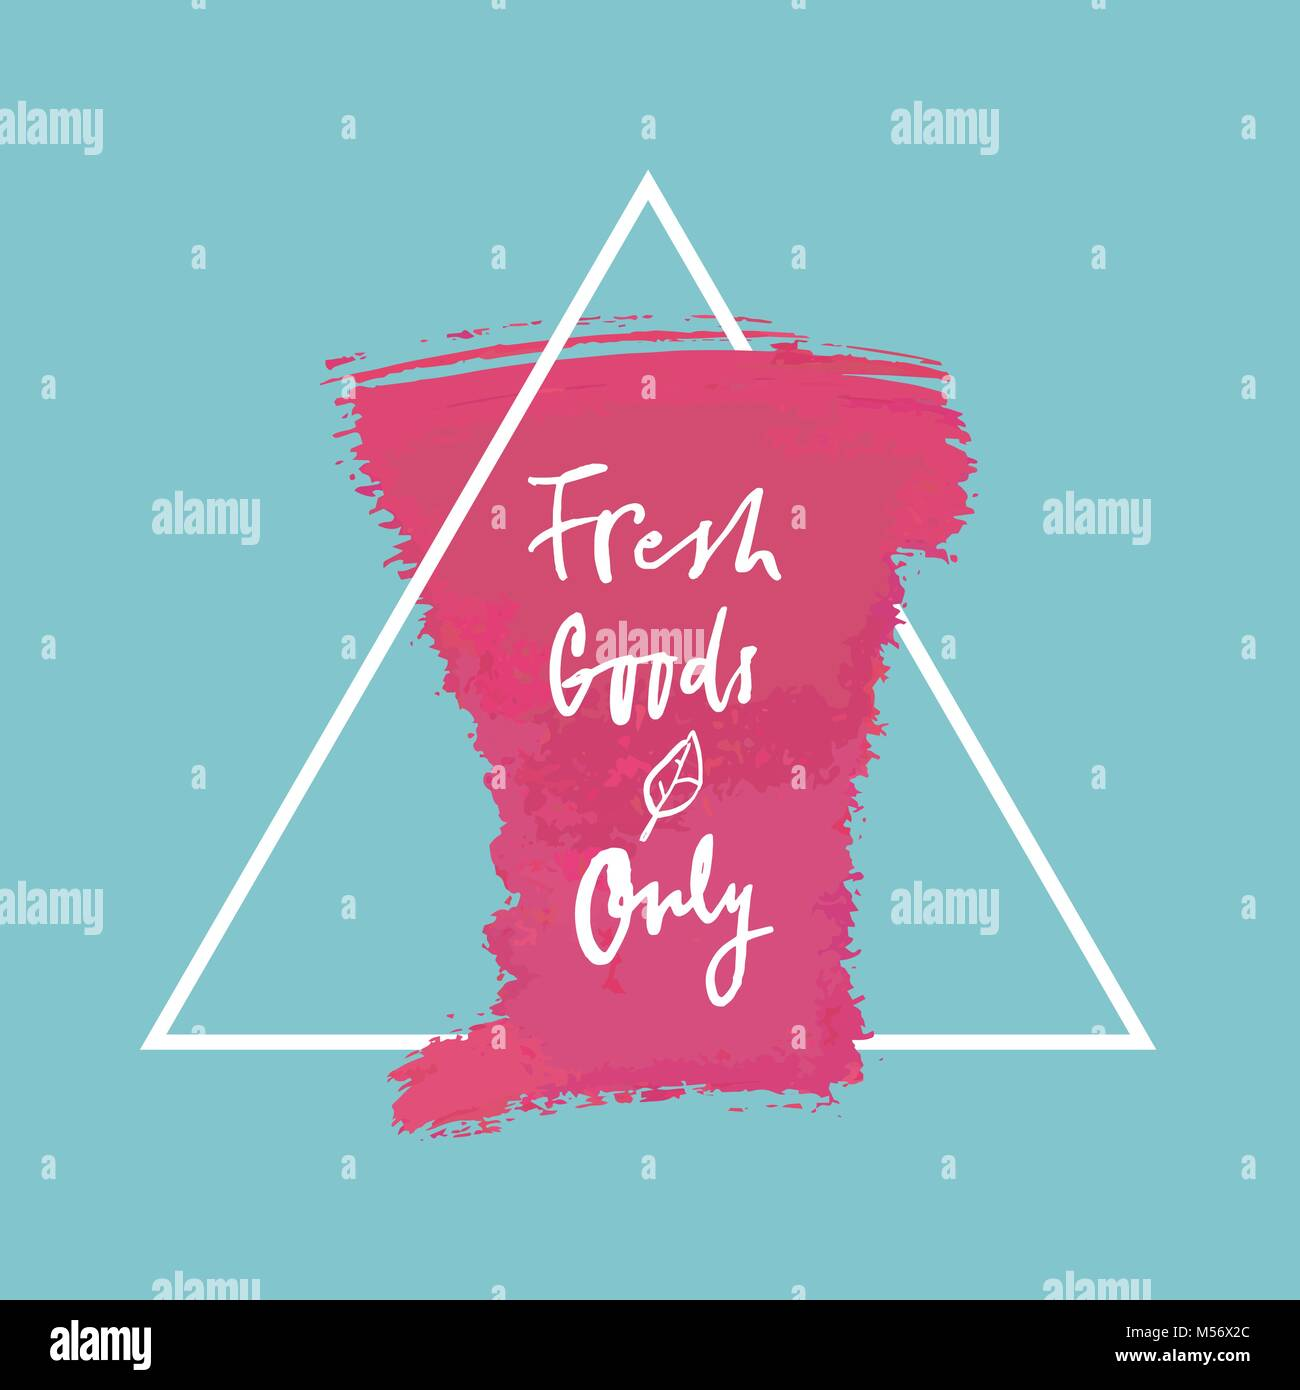 Vector Fresh Goods Only label - Stock Vector